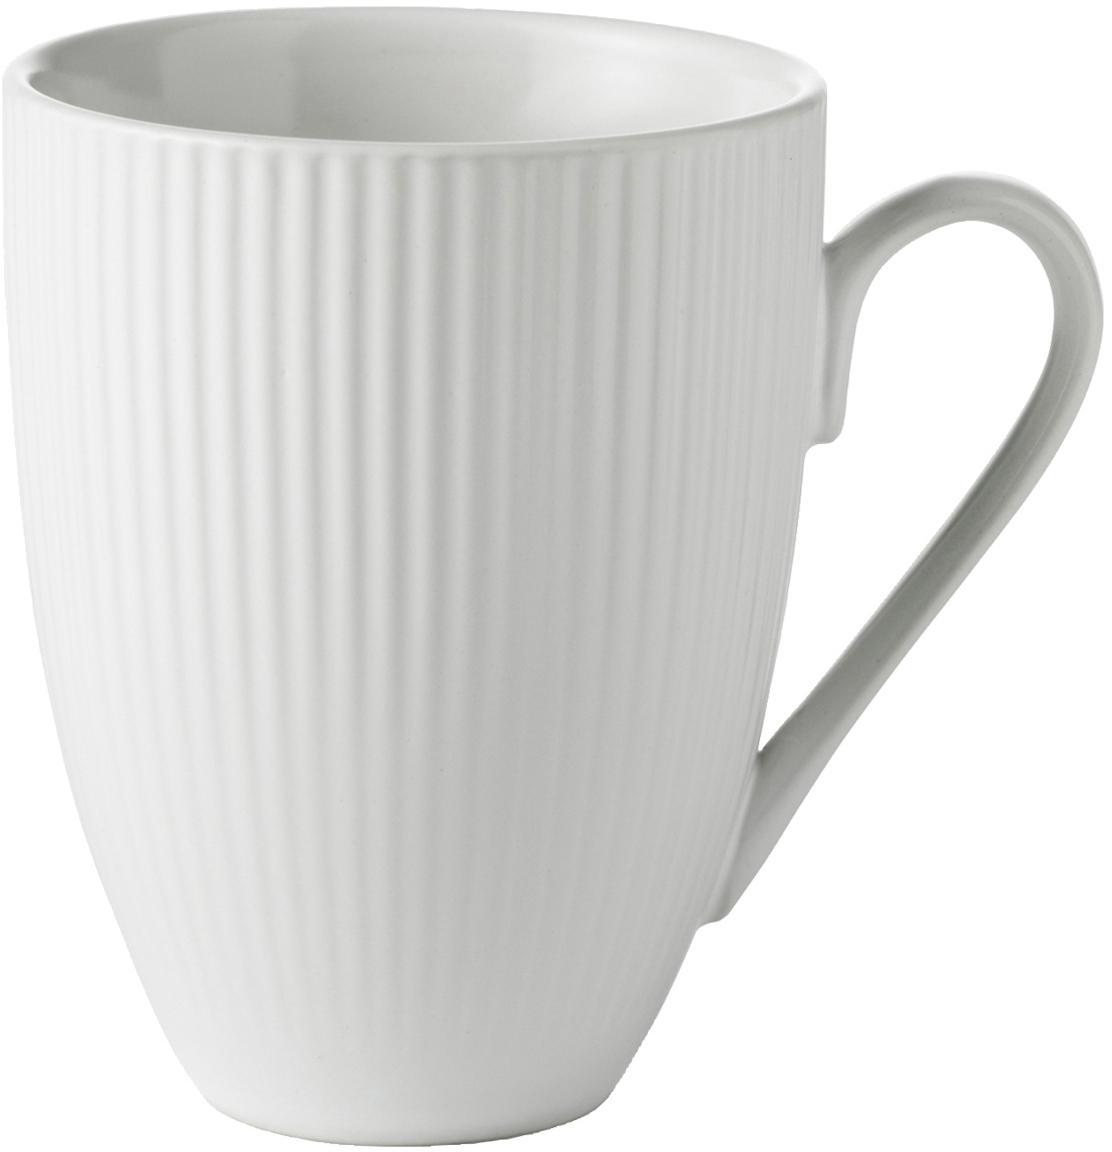 Tazza con struttura rigata Groove 4 pz, Terracotta, Bianco, Ø 9 x Alt. 11 cm